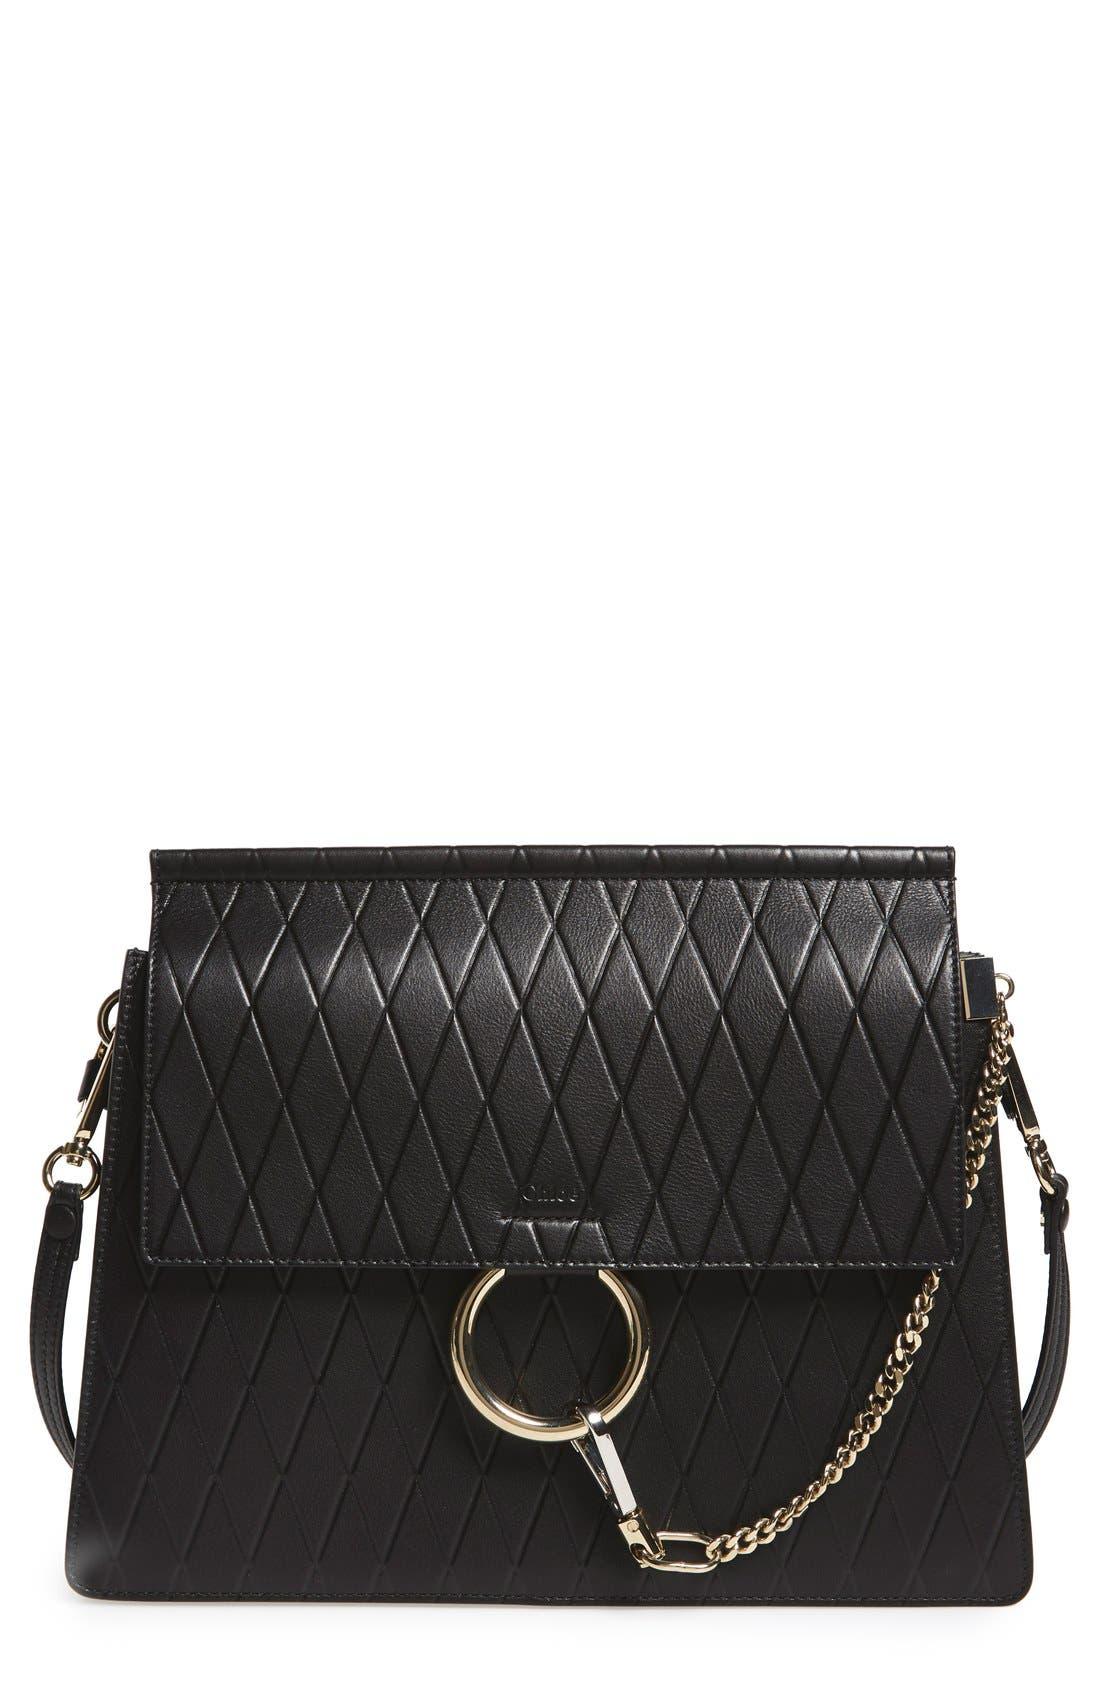 Main Image - Chloé 'Medium Faye' Diamond Embossed Leather Shoulder Bag